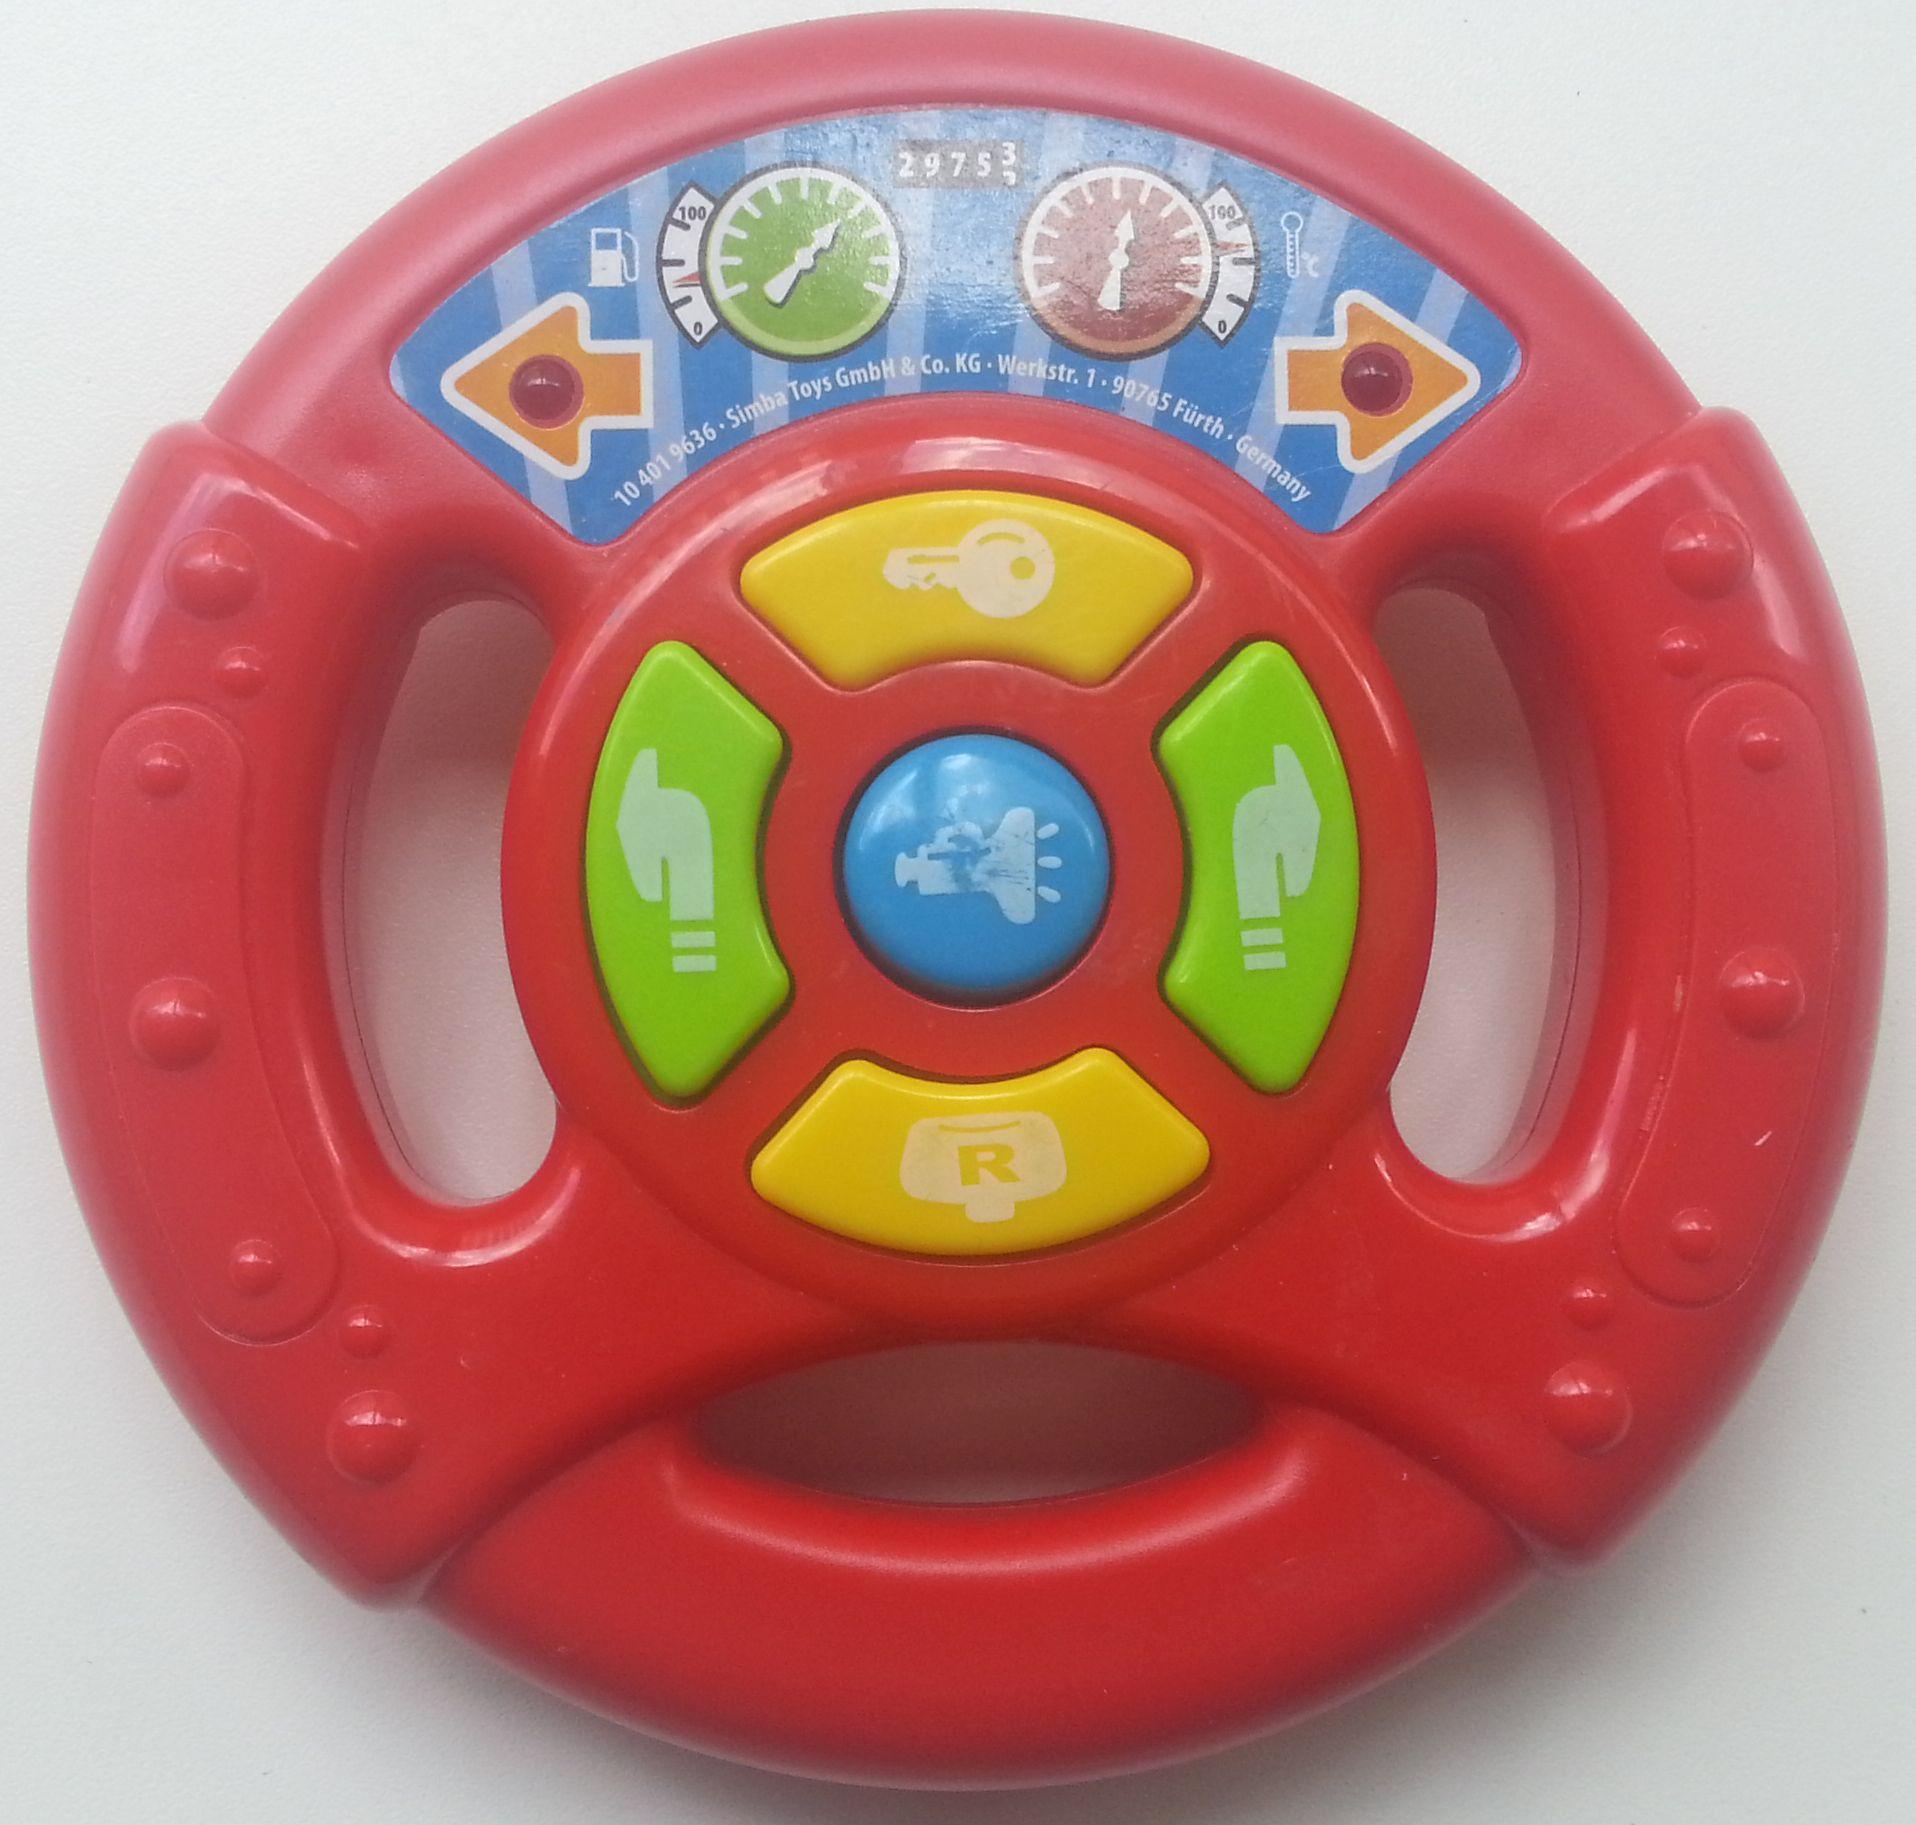 Speelgoed Stuur Baby Visiebinnenstadmaastricht